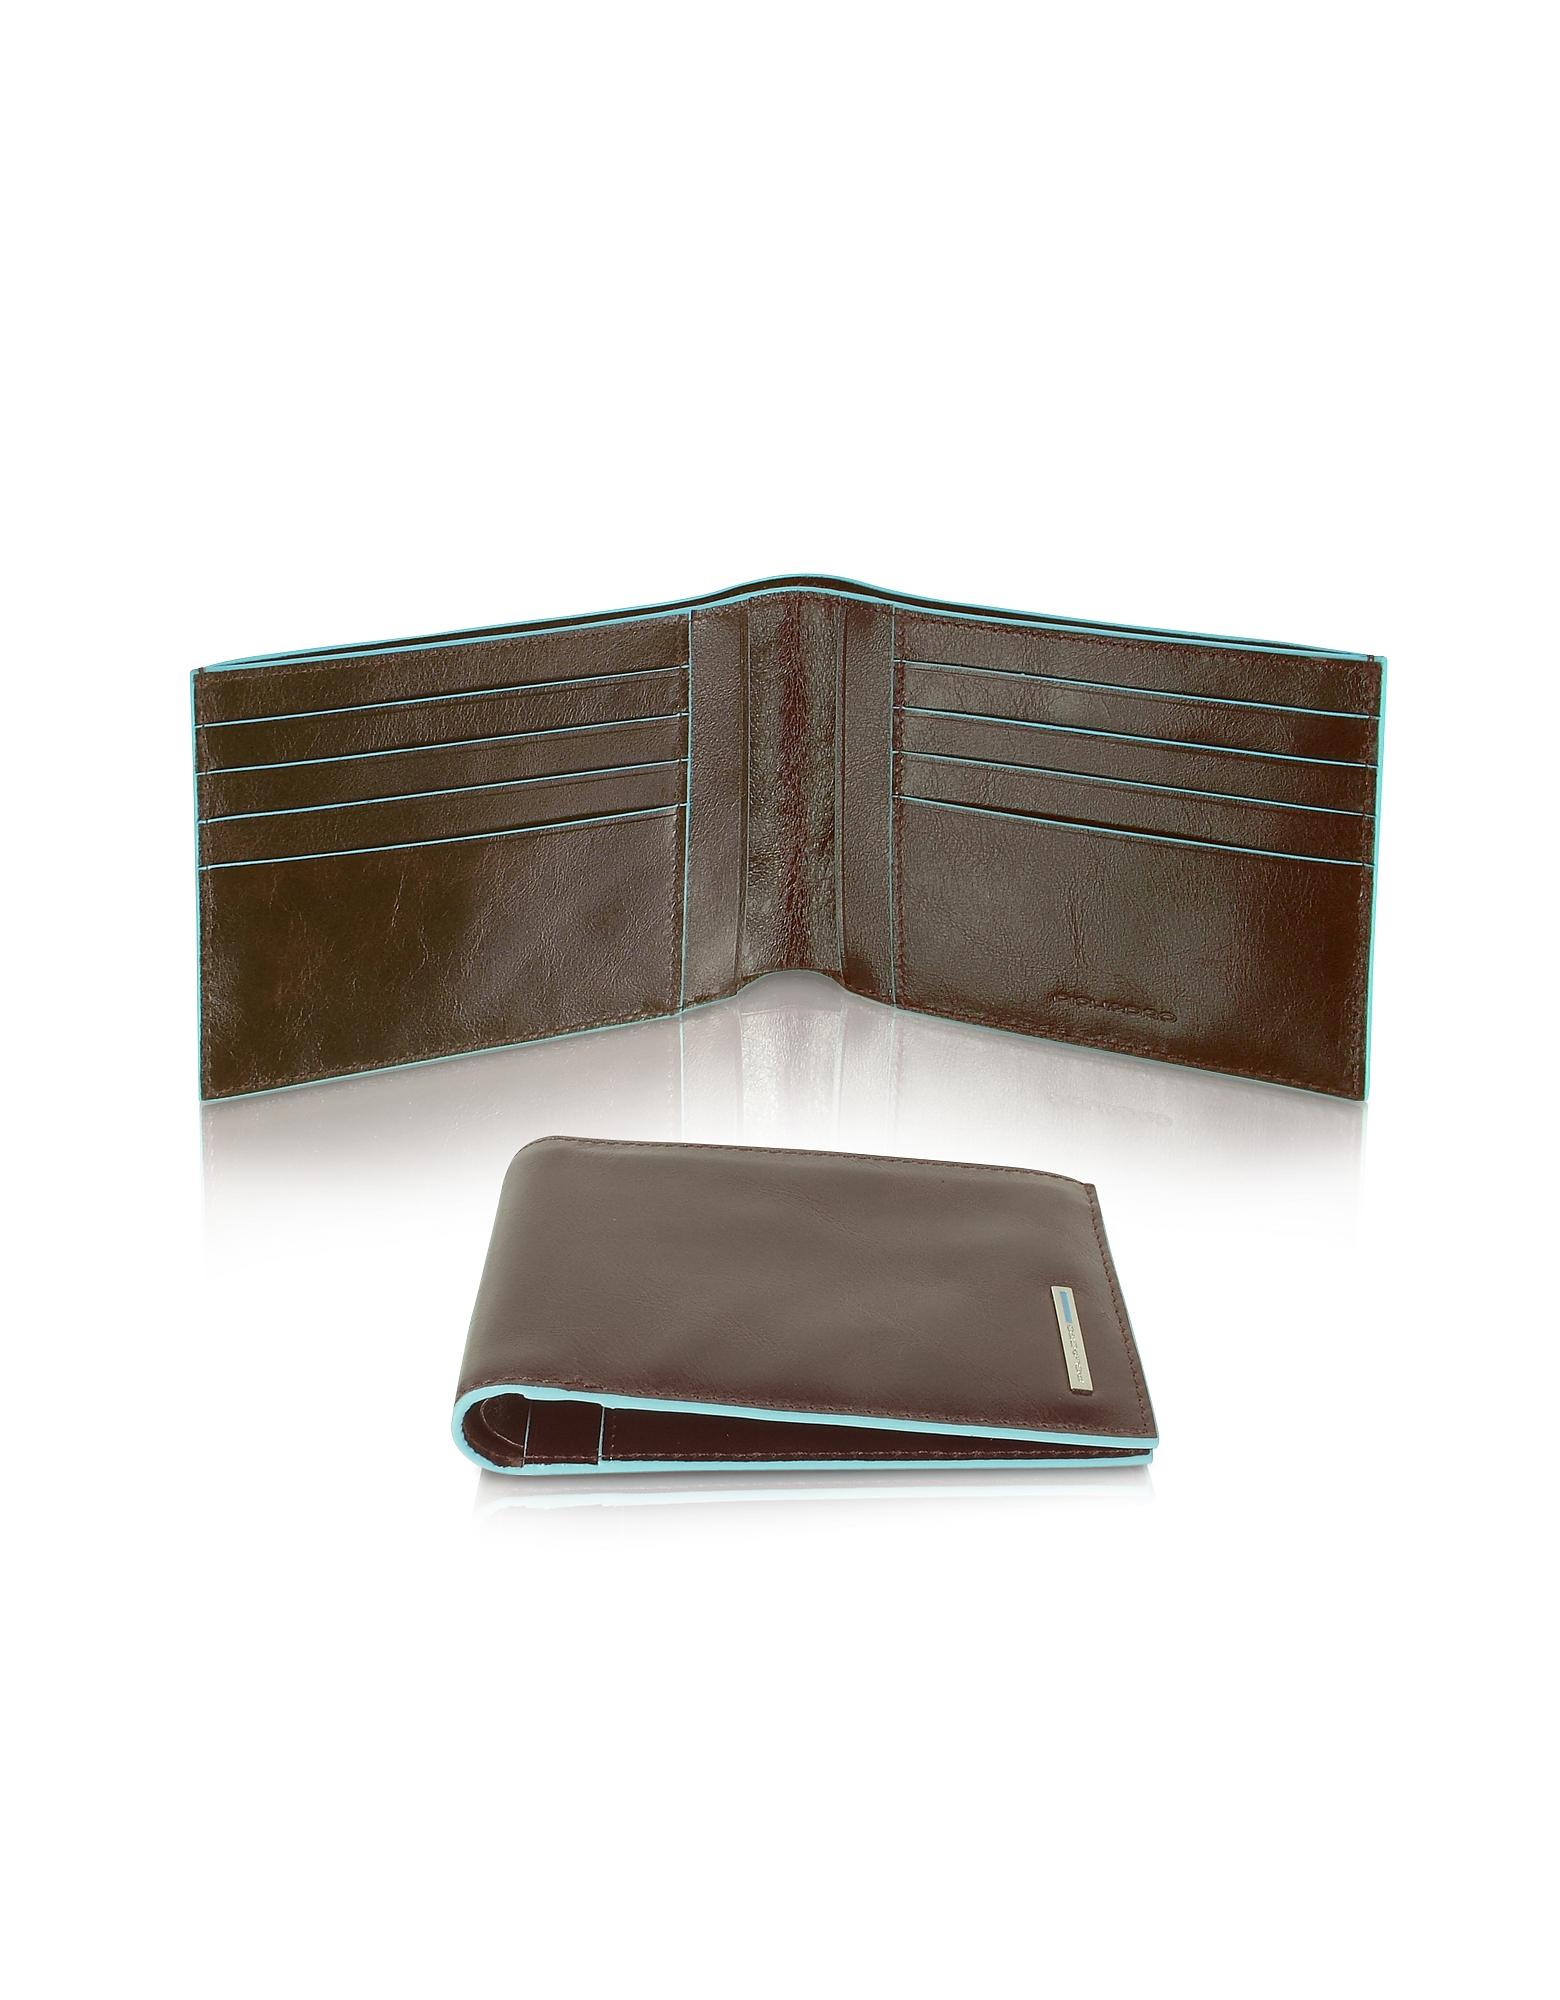 Piquadro Designer Wallets,  Blue Square-Men's Billfold Leather Wallet